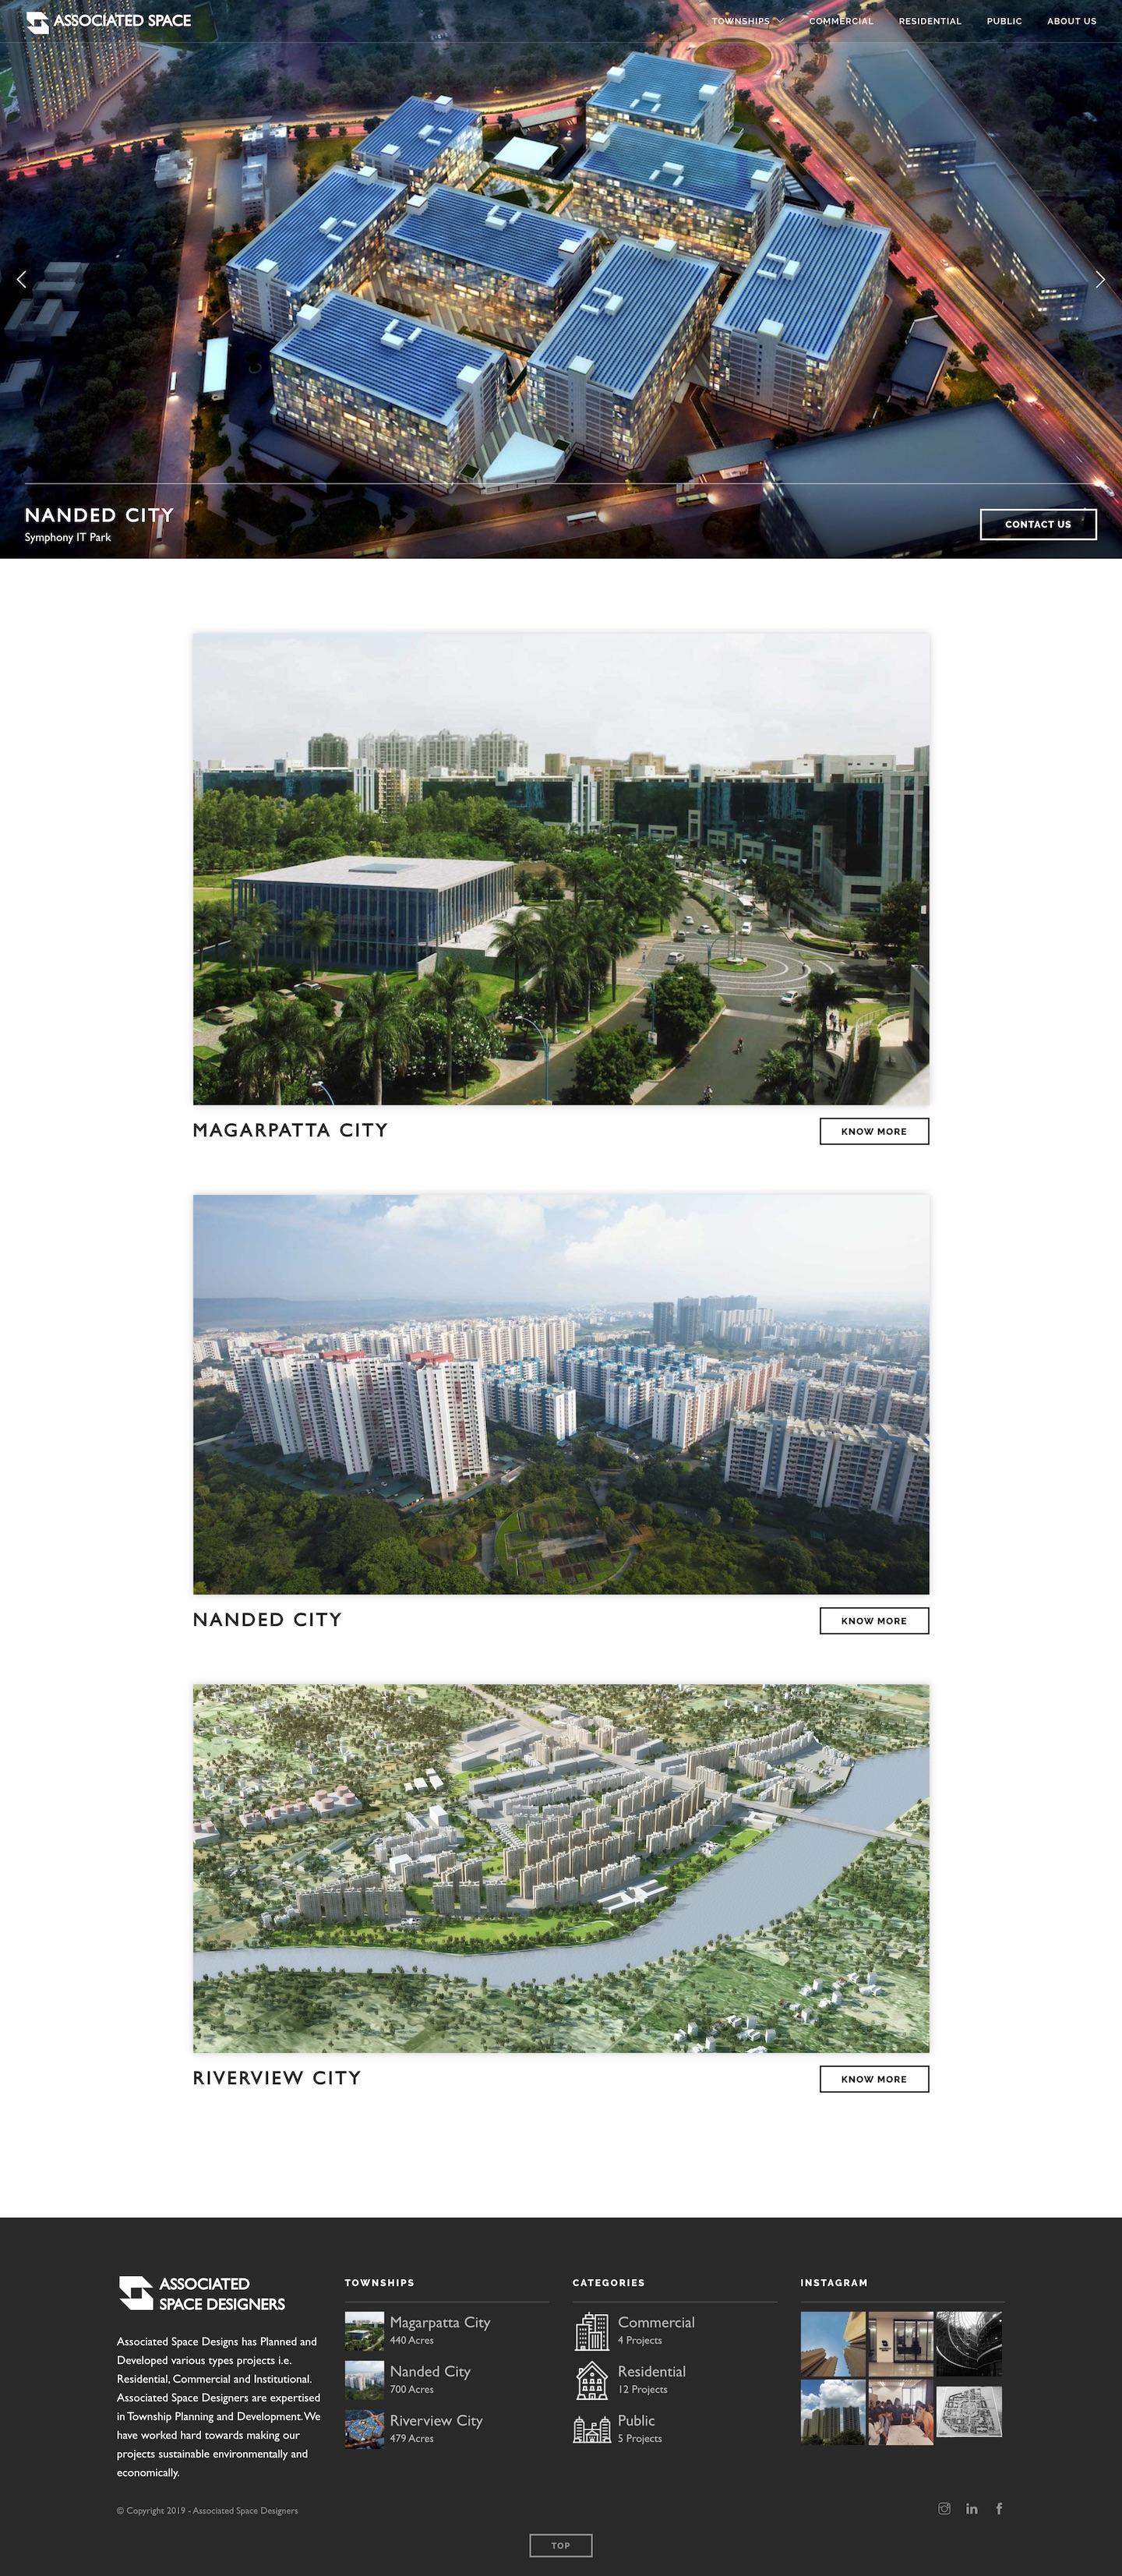 associated.space-Laravel-CMS-Website-Development-Pune-India